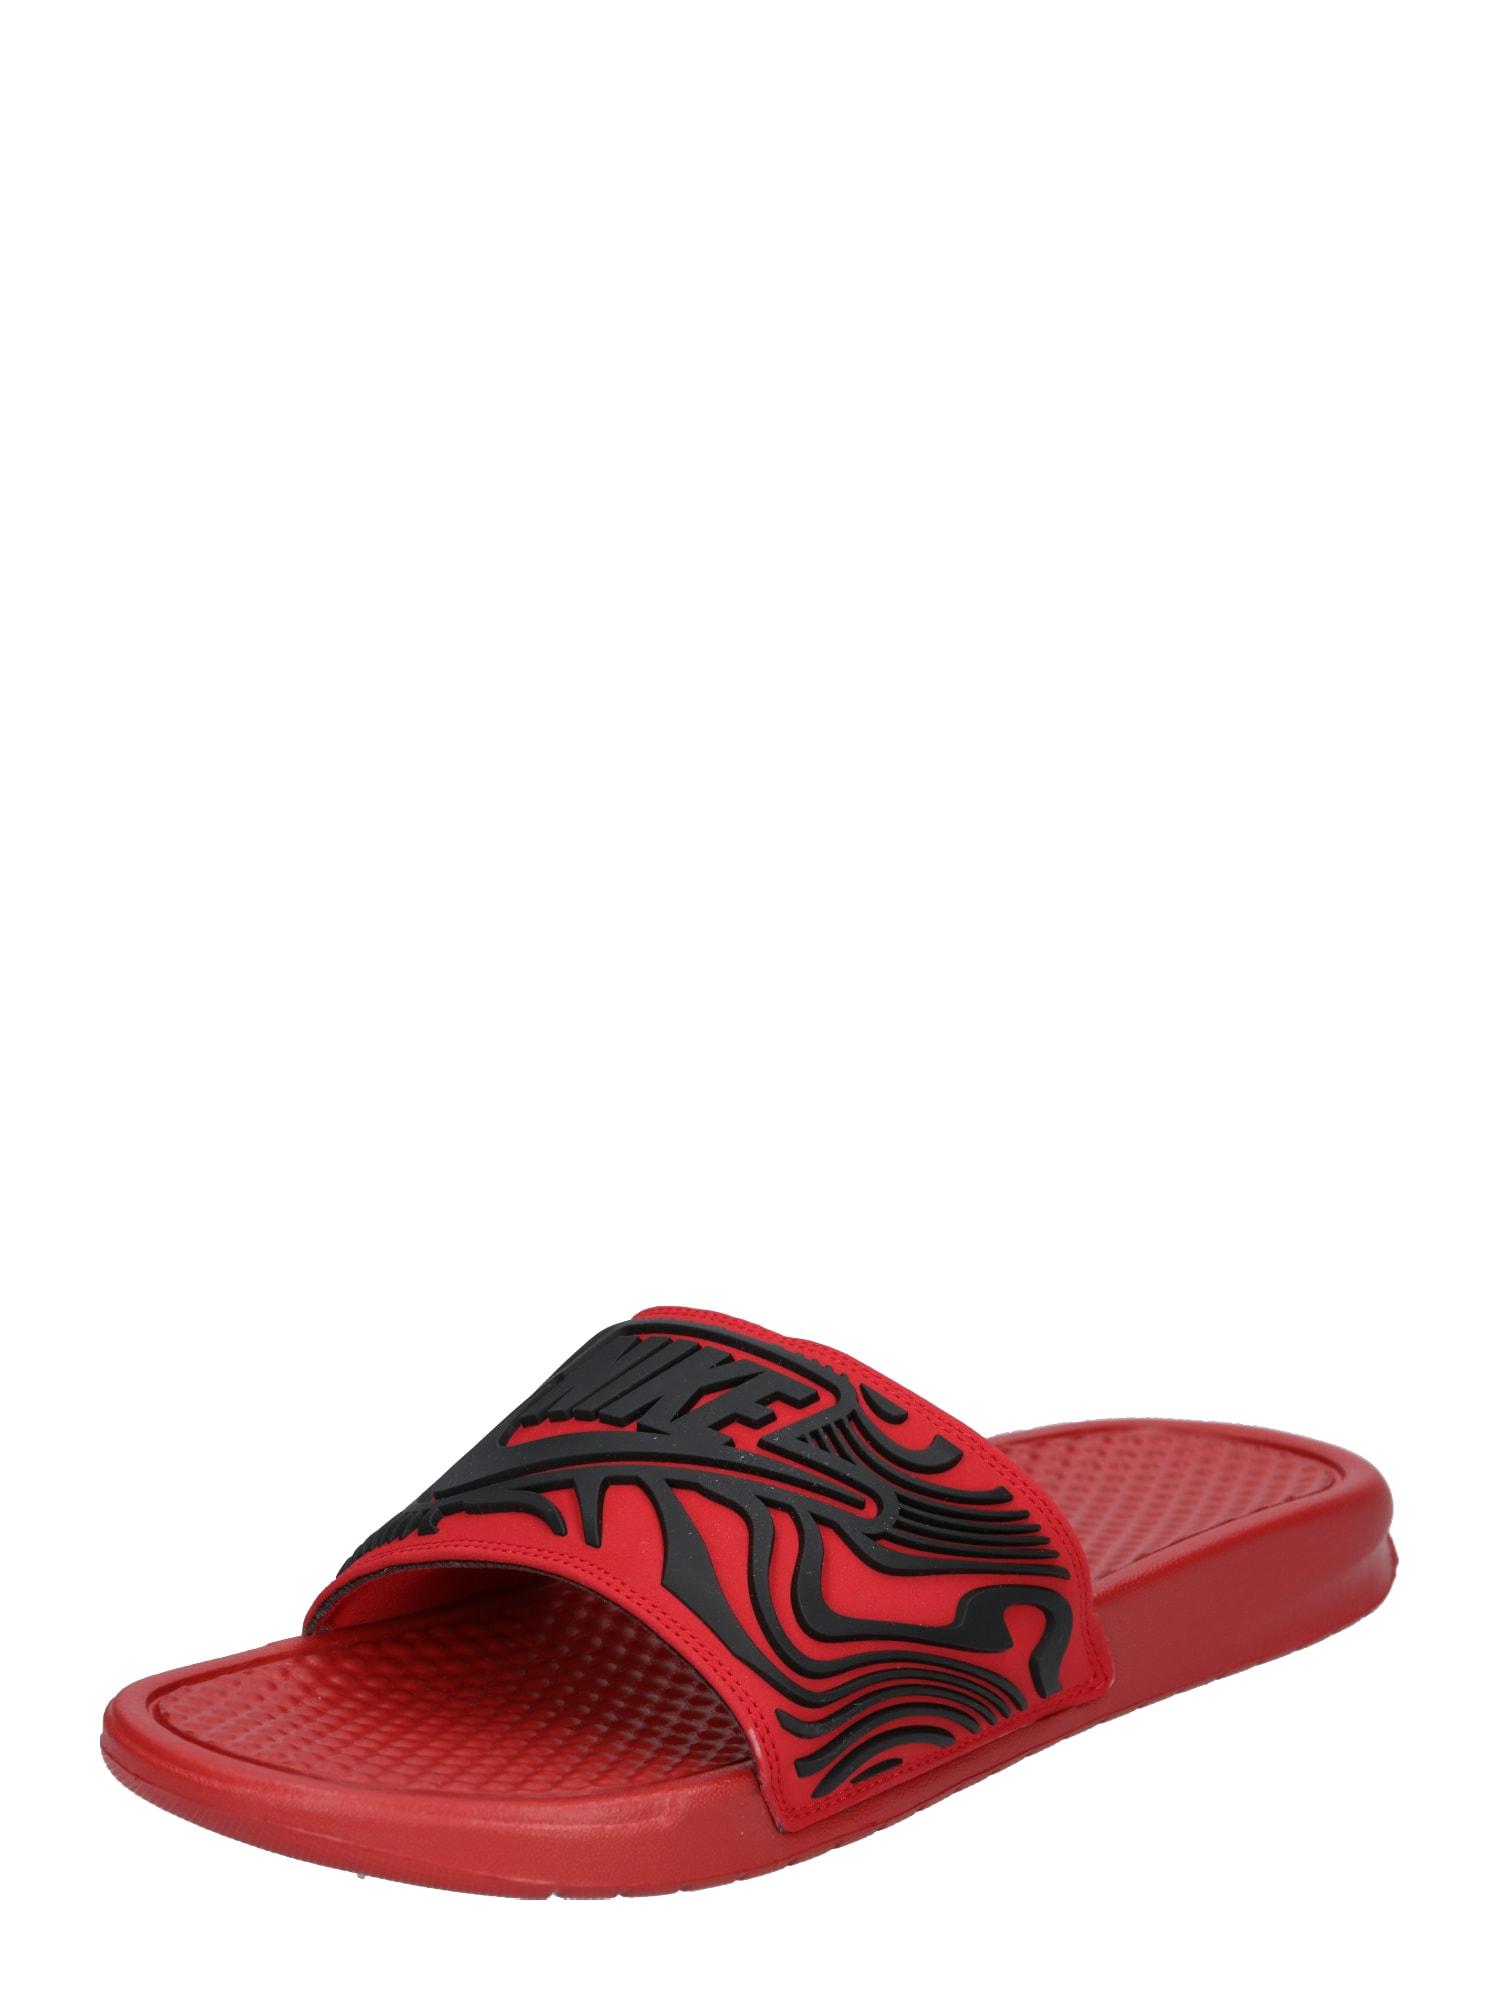 Nike Sportswear, Heren Strand-/badschoen 'BENASSI JDI SE', rood / zwart